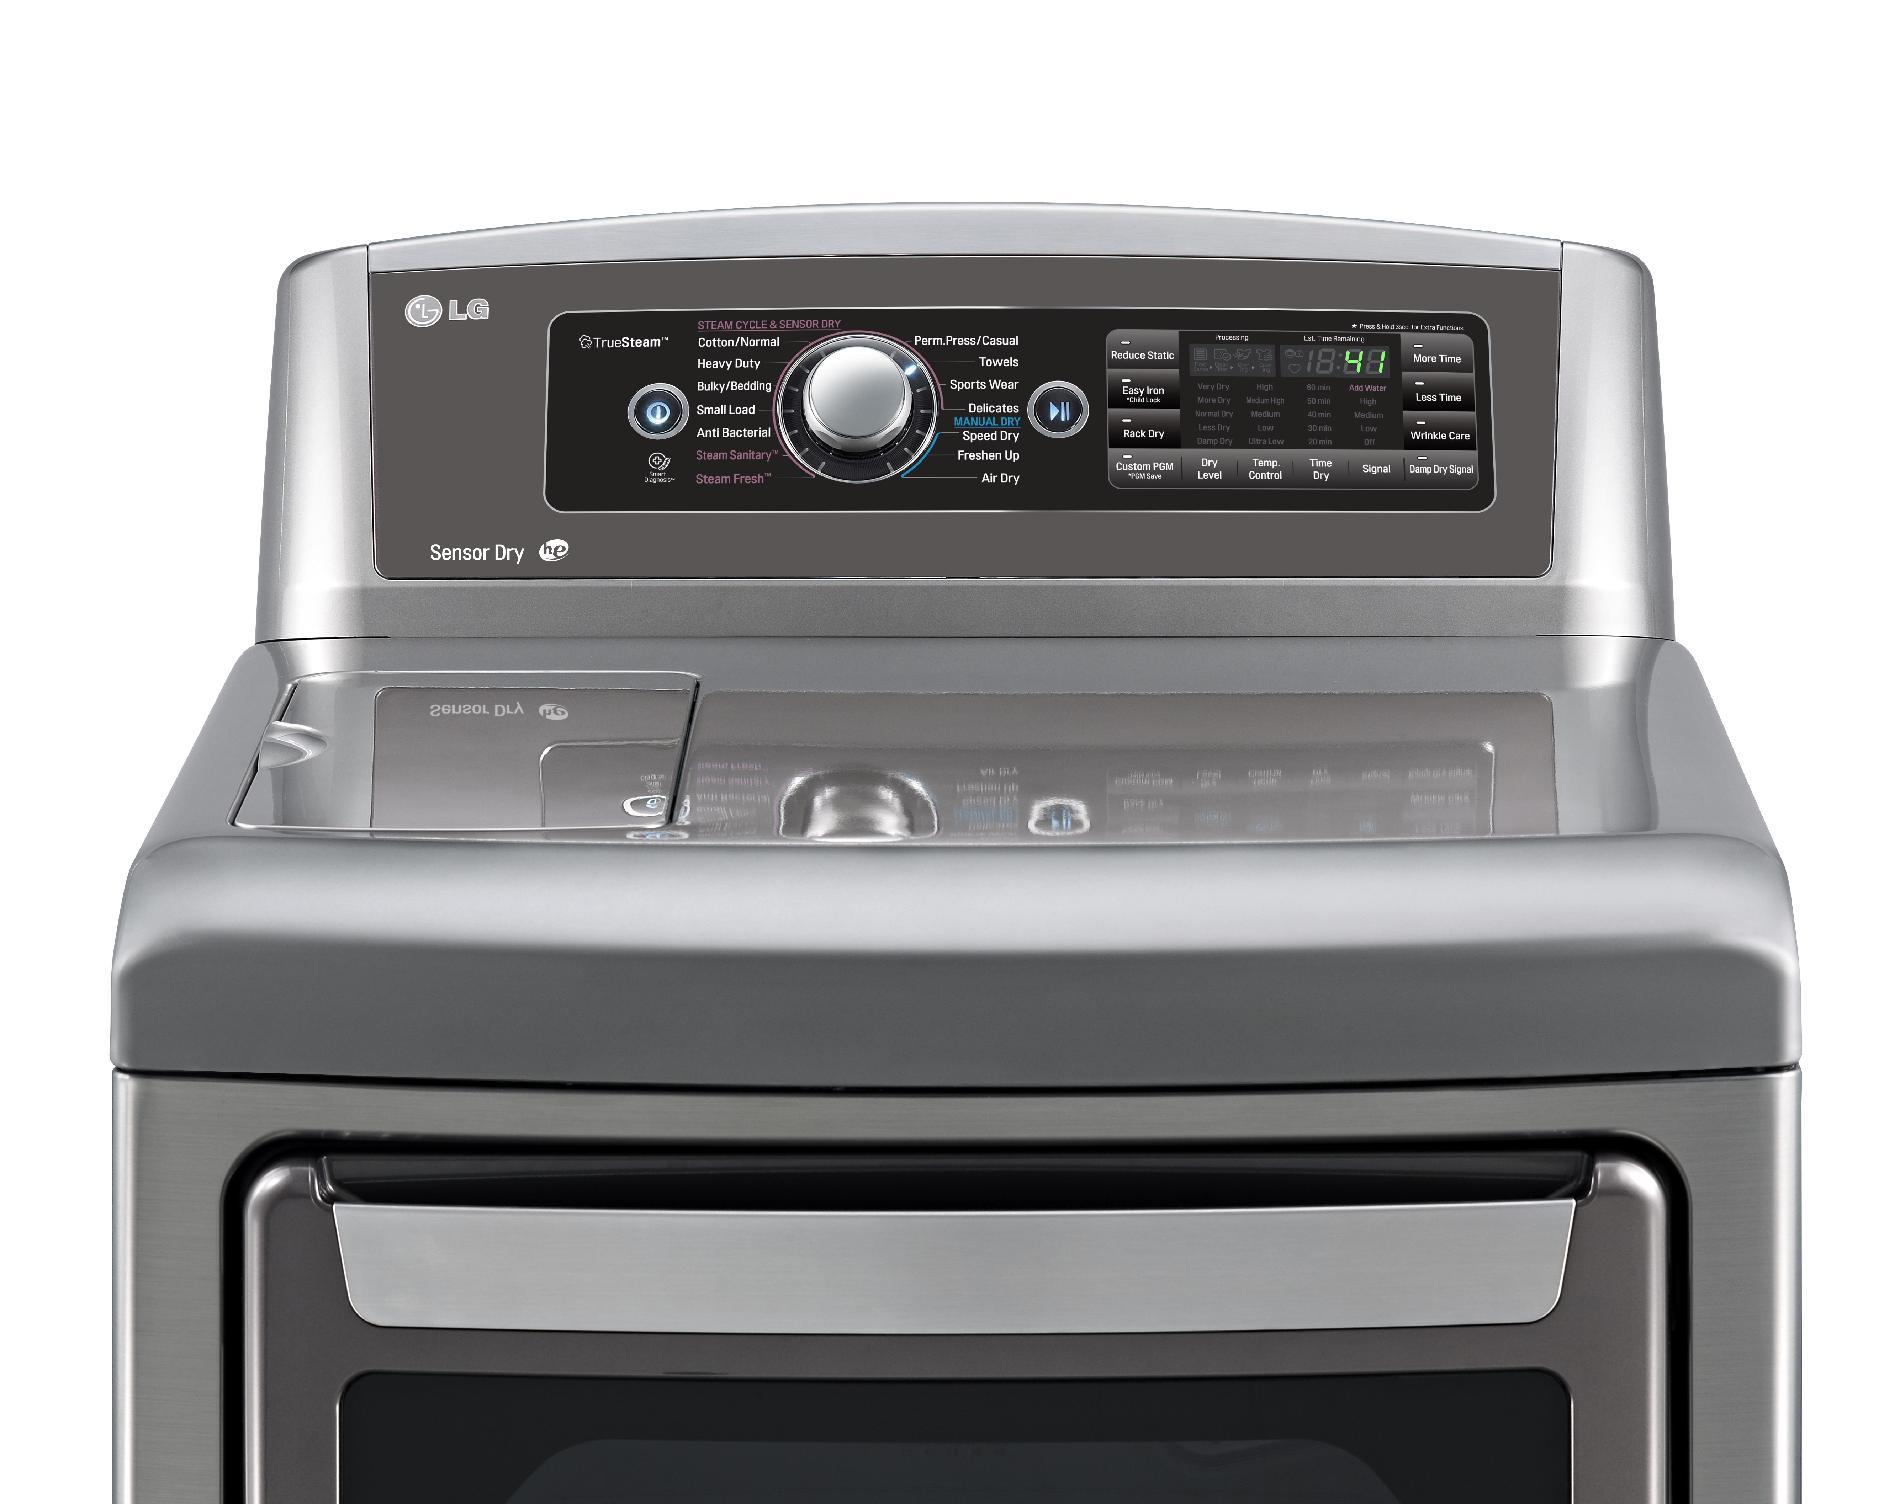 LG 7.3 cu. ft. Electric Dryer w/ SteamSanitary™ - Graphite Steel